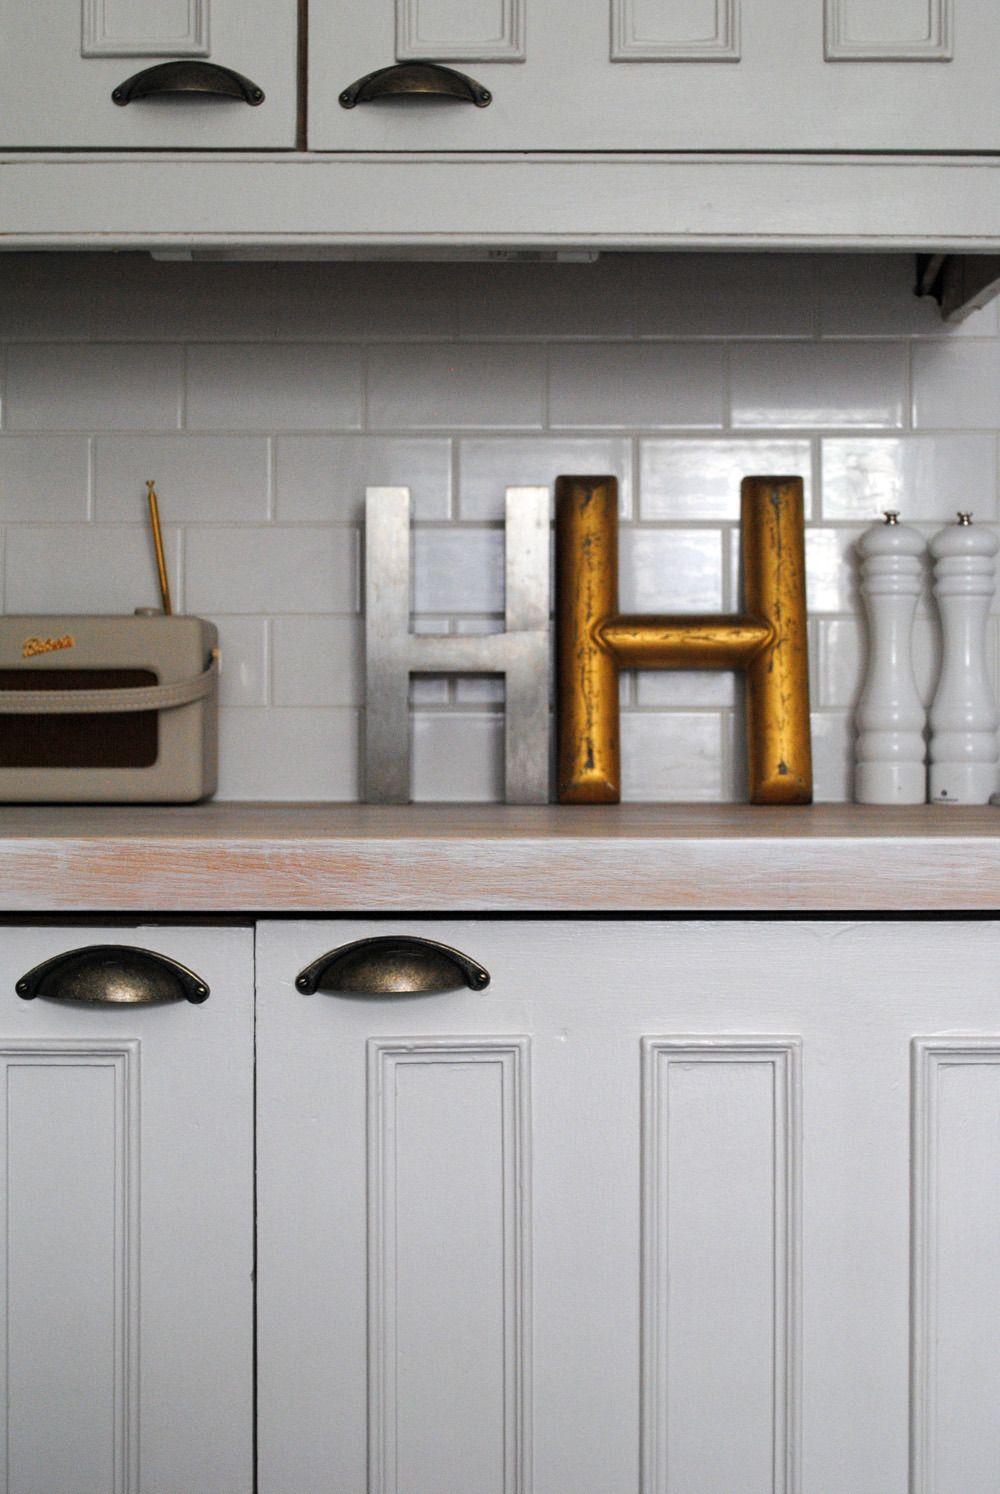 Katharine u jamesu glamorous family home in london door handles